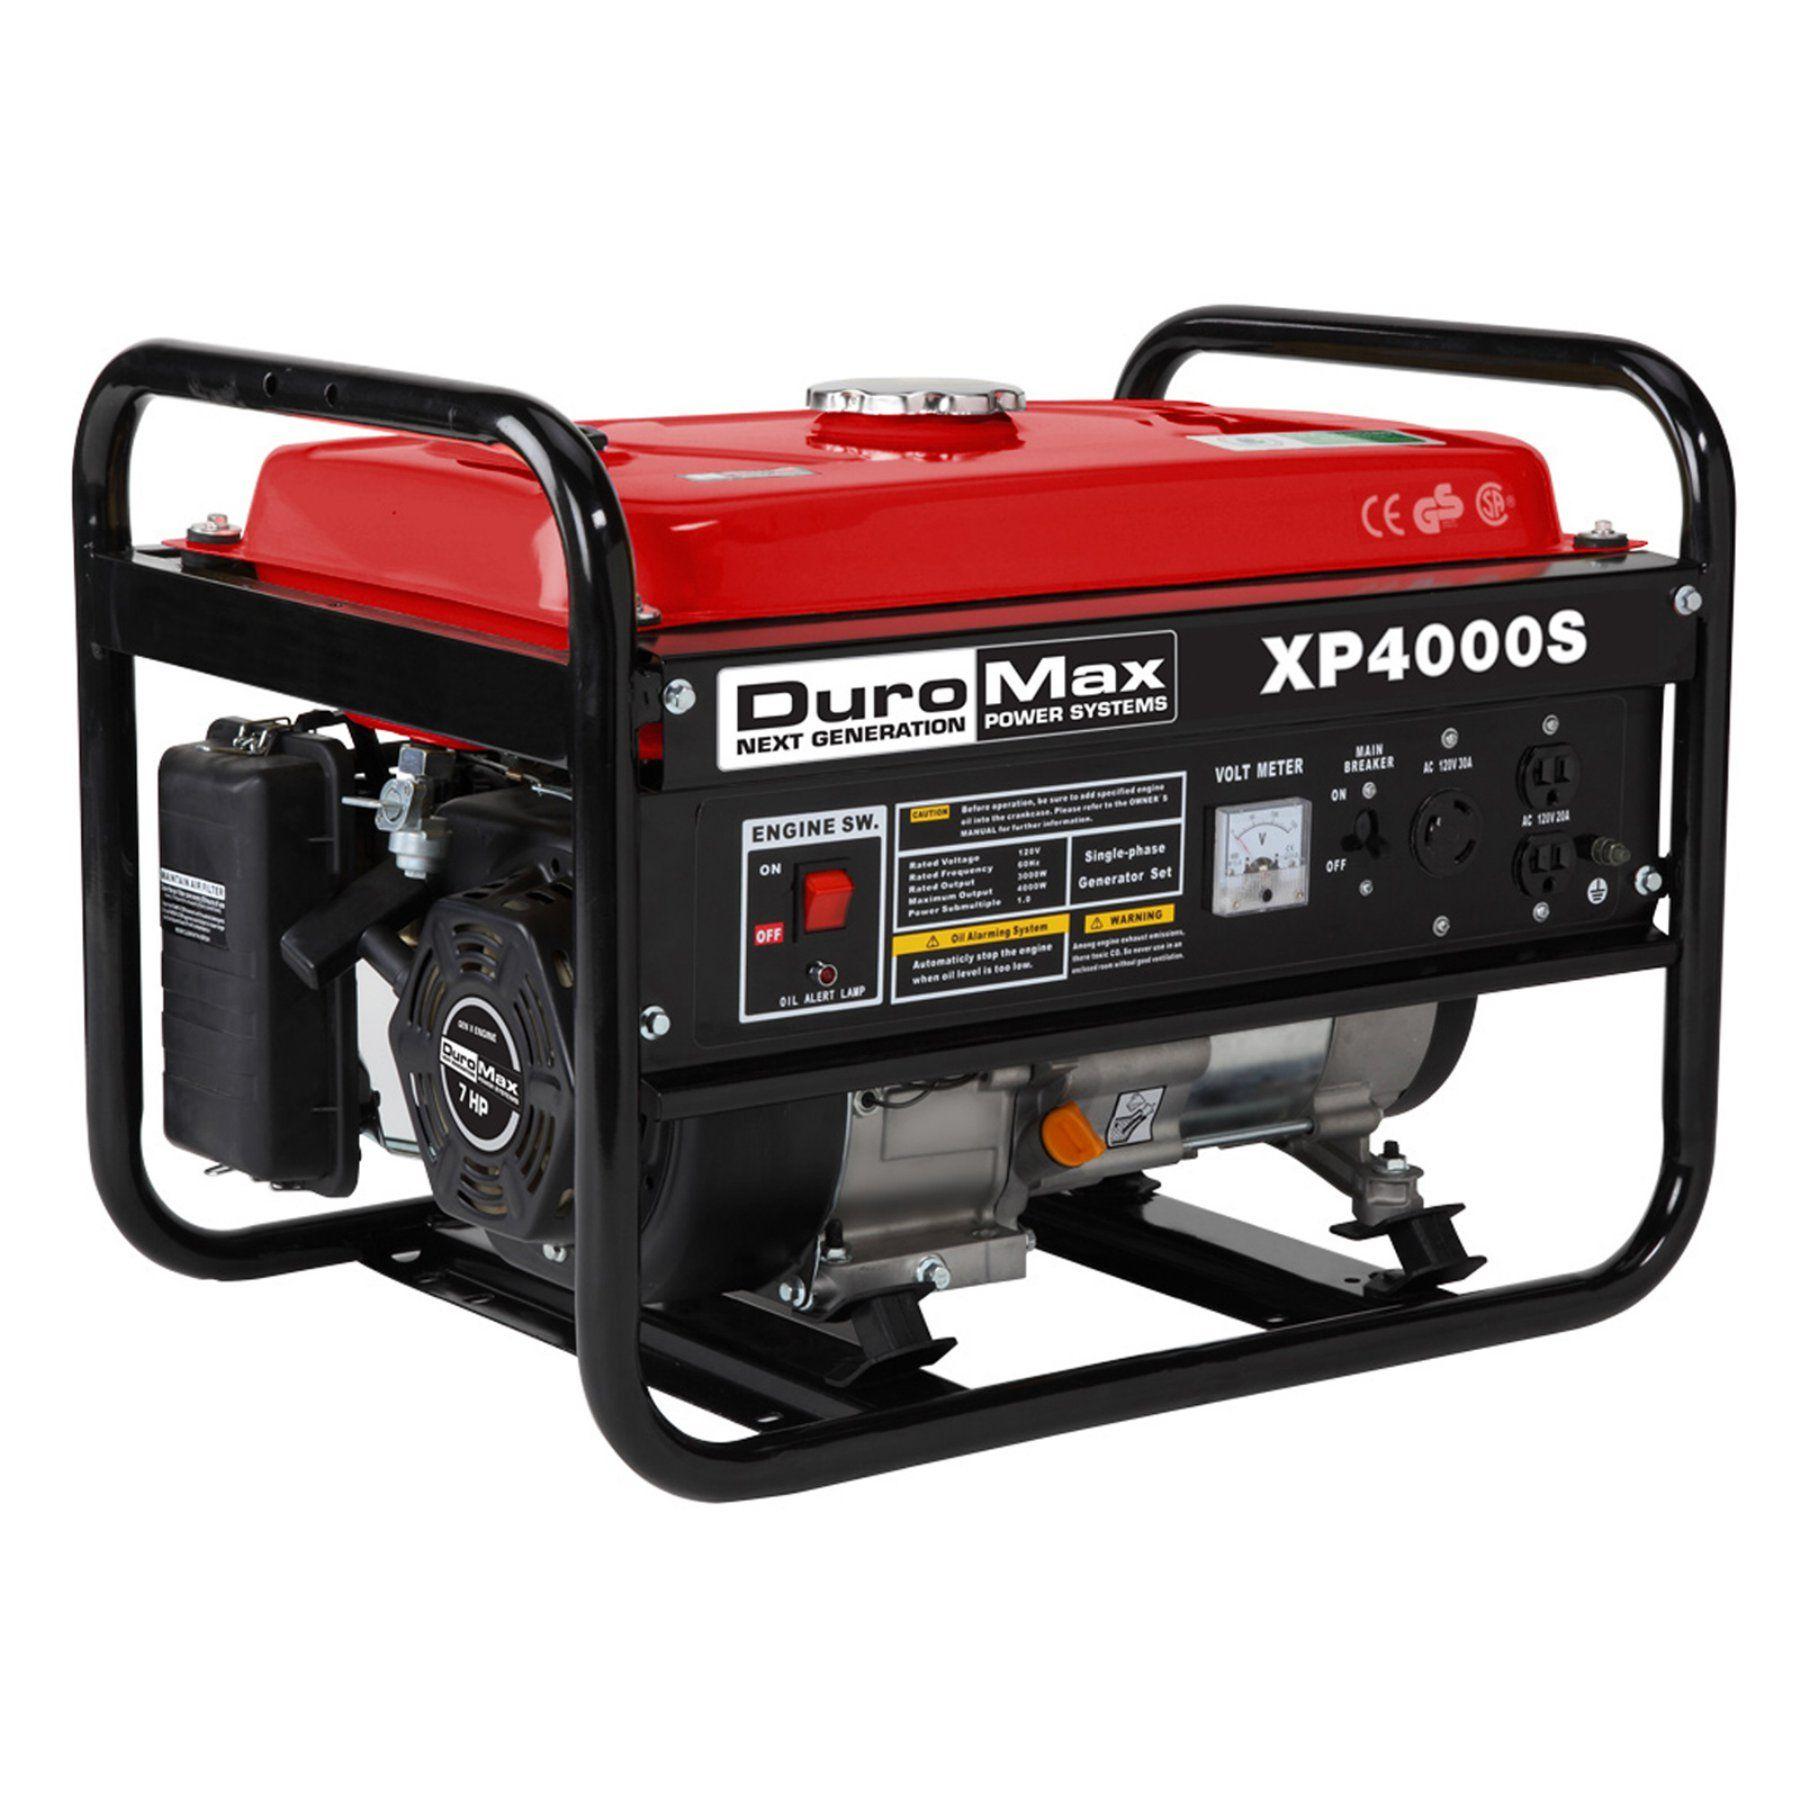 DuroMax 4000 Watt 7 0 Hp Gas Engine Portable RV Generator